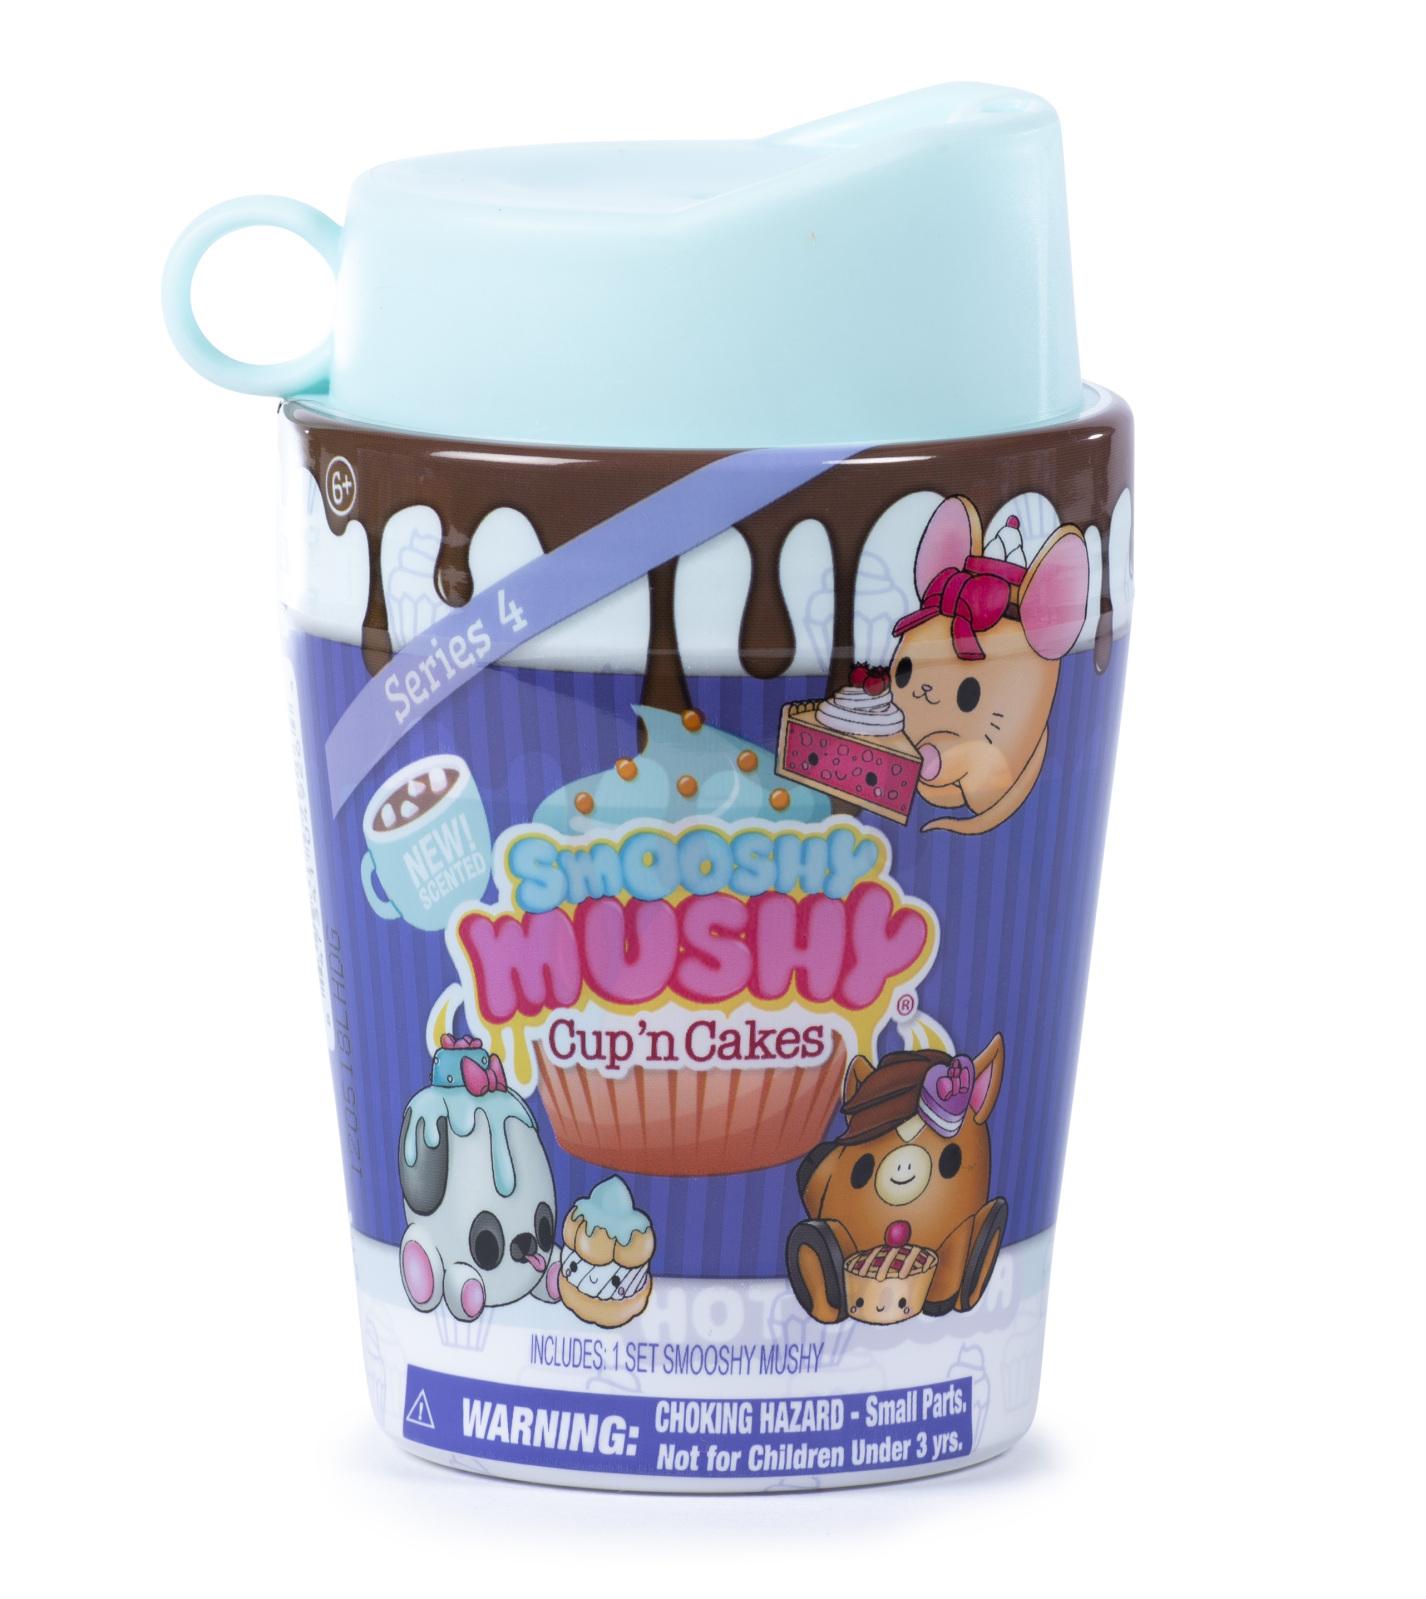 Smooshy Mushy Core Pets Series 4